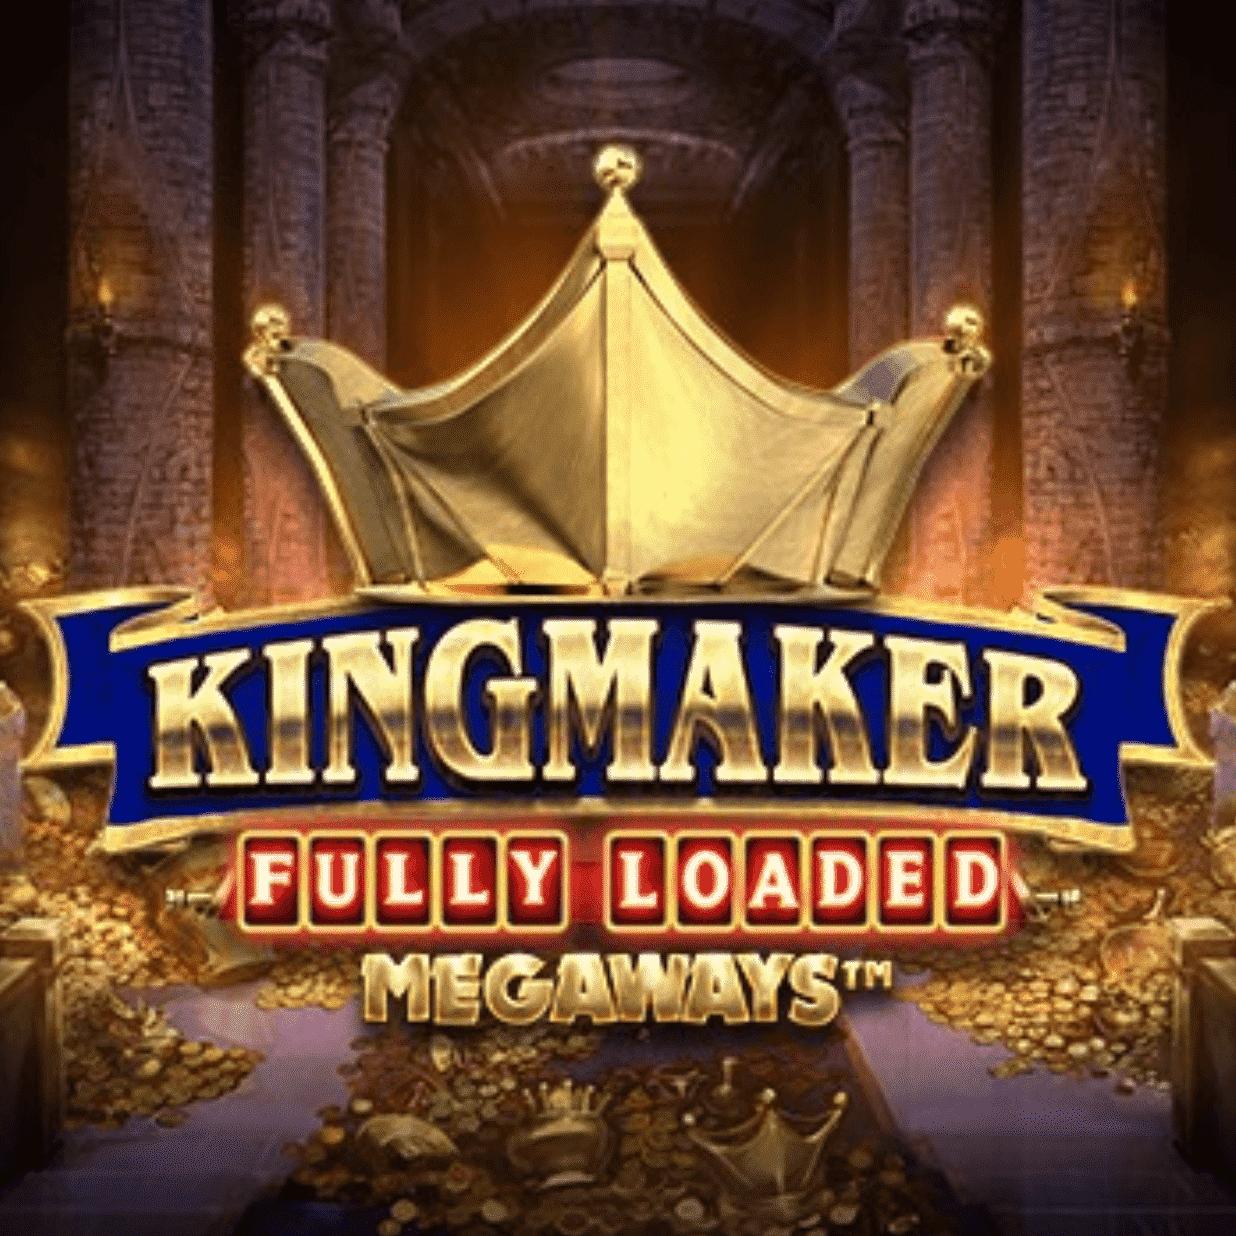 Kingmaker Megaways Fully Loaded Logo